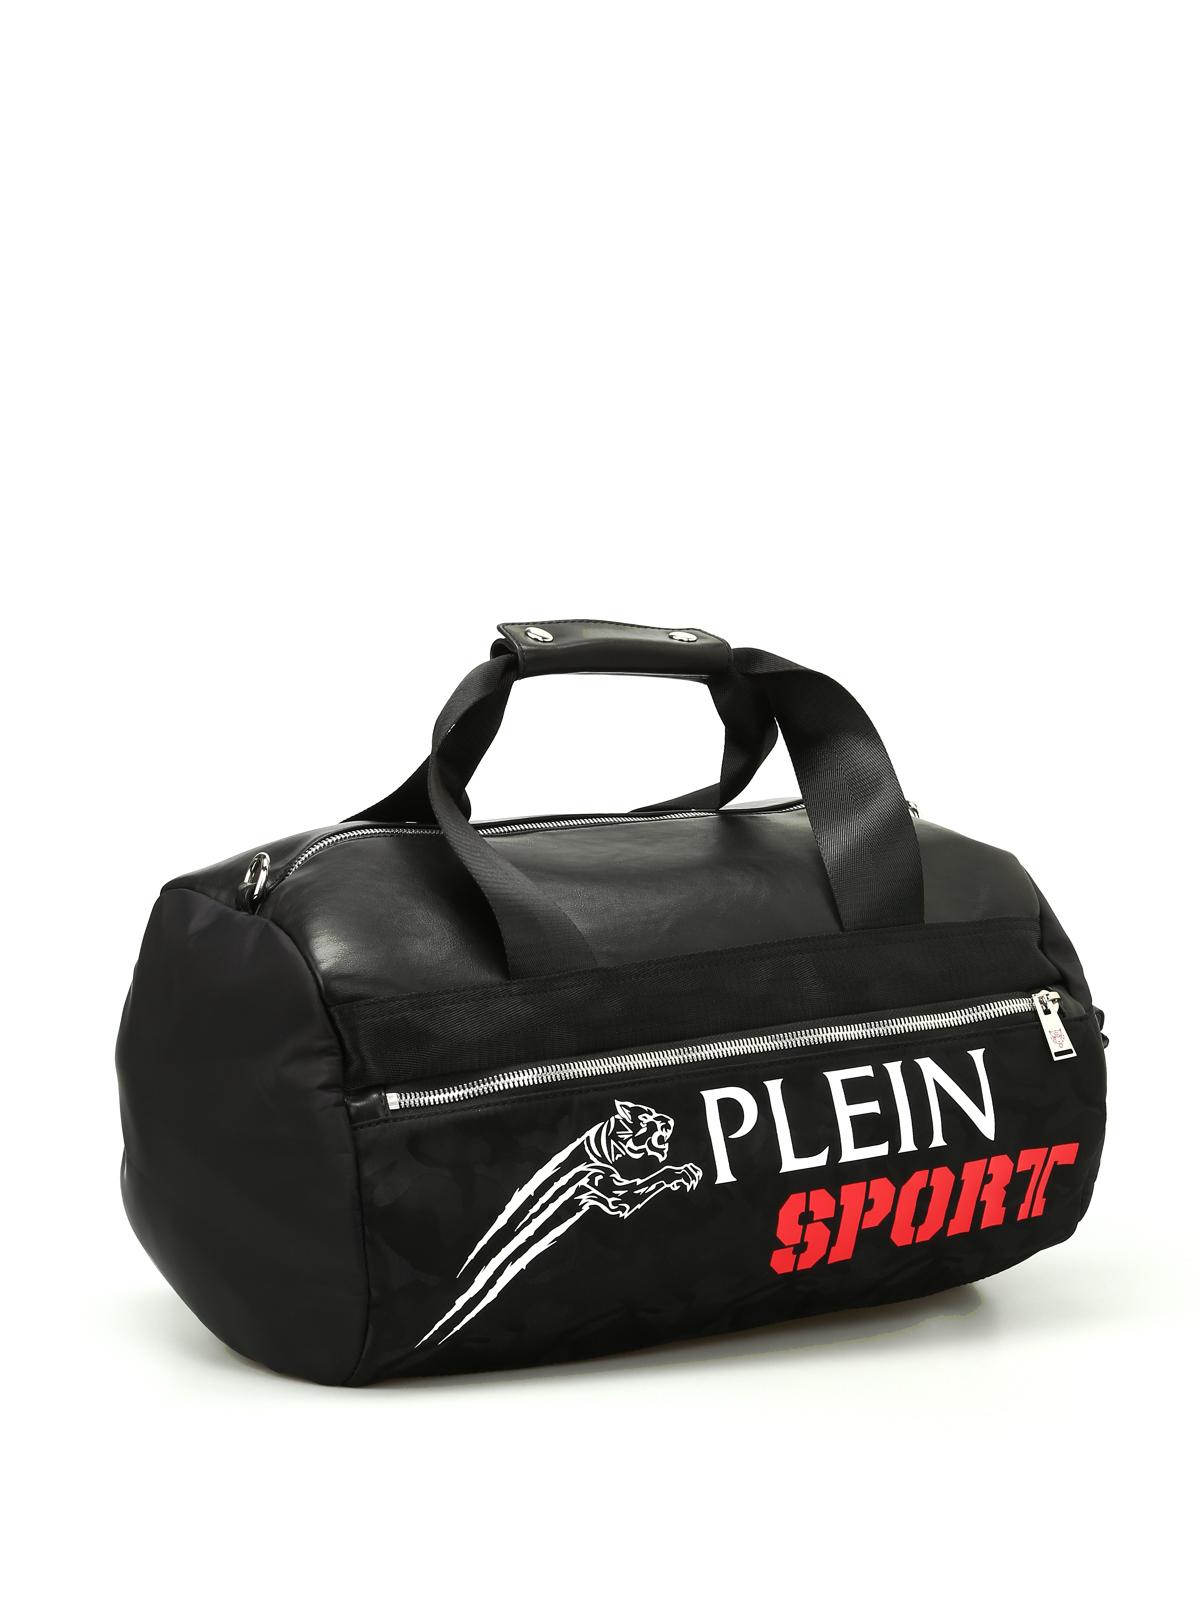 philipp plein hose rucksack